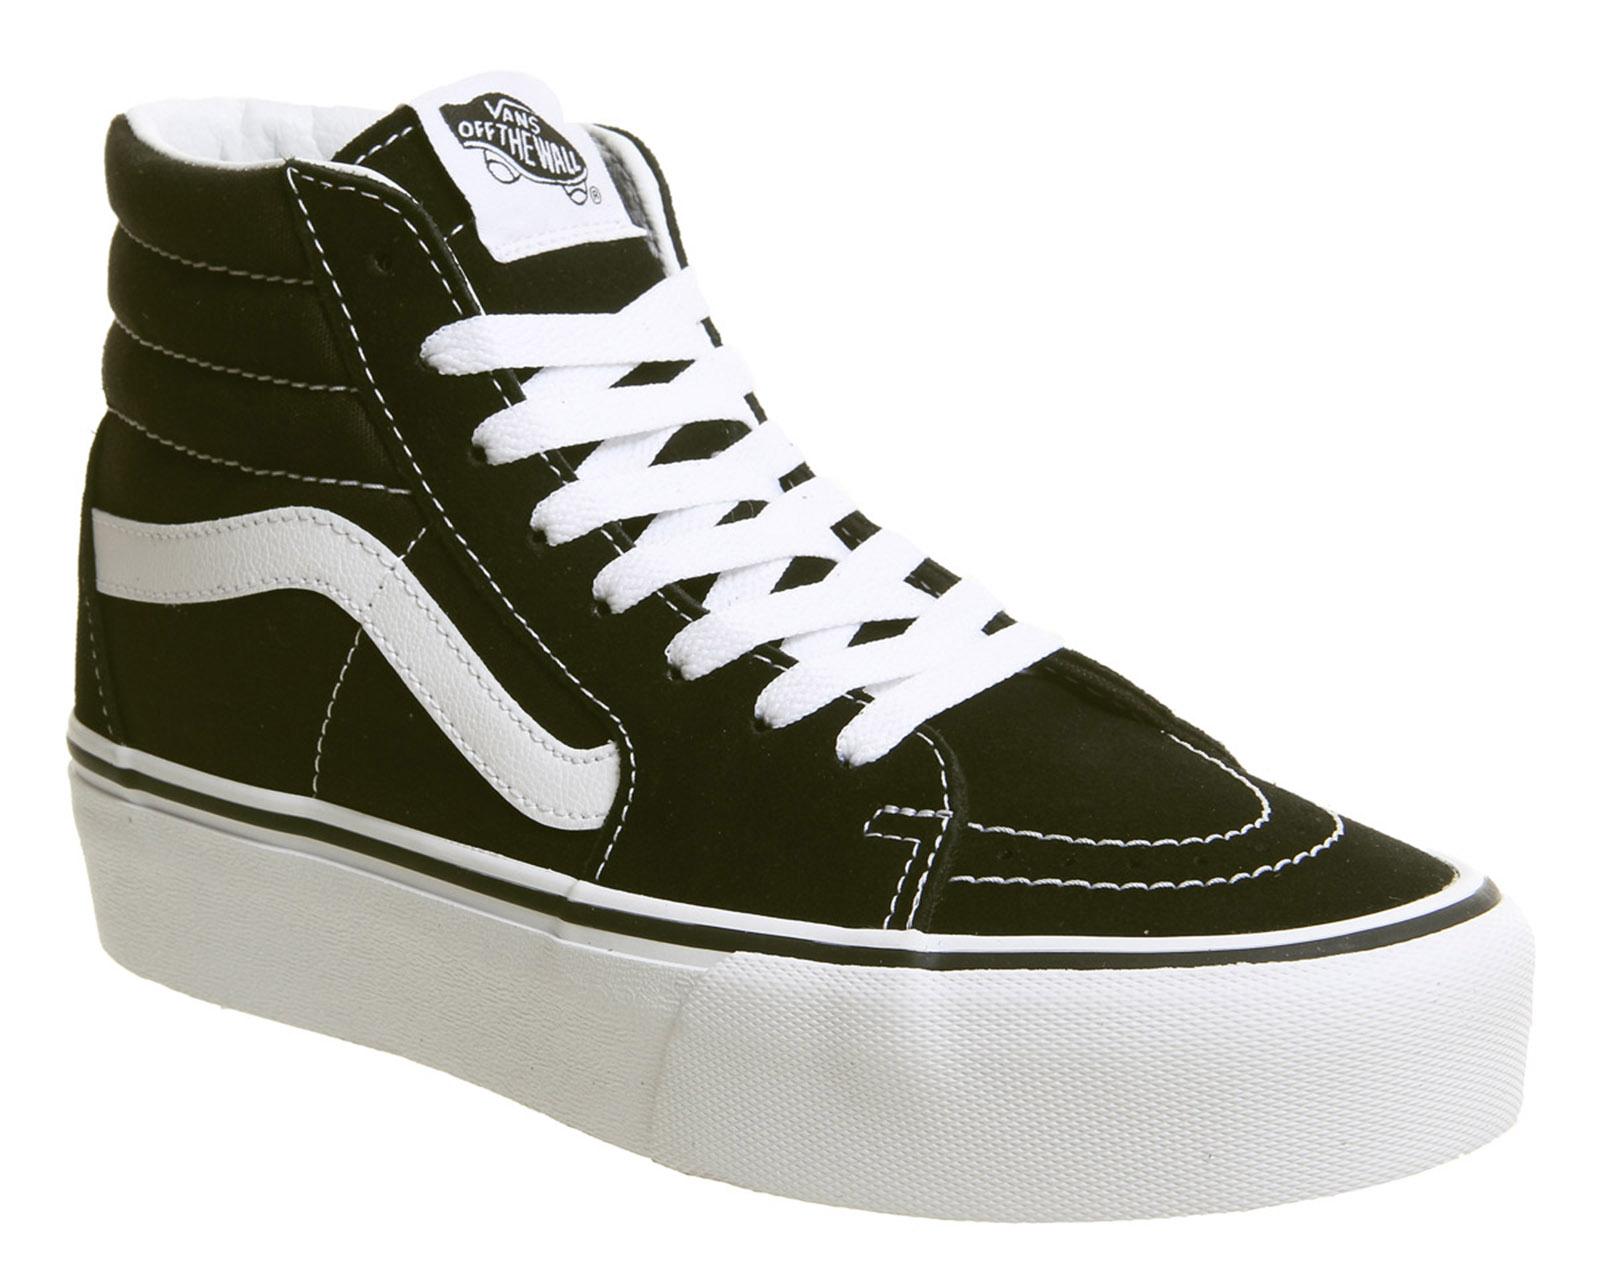 0bcfeb351da5 Sentinel Womens Vans Sk8 Hi Platform 2.0 Trainers Black True White Trainers  Shoes. Sentinel Thumbnail 2